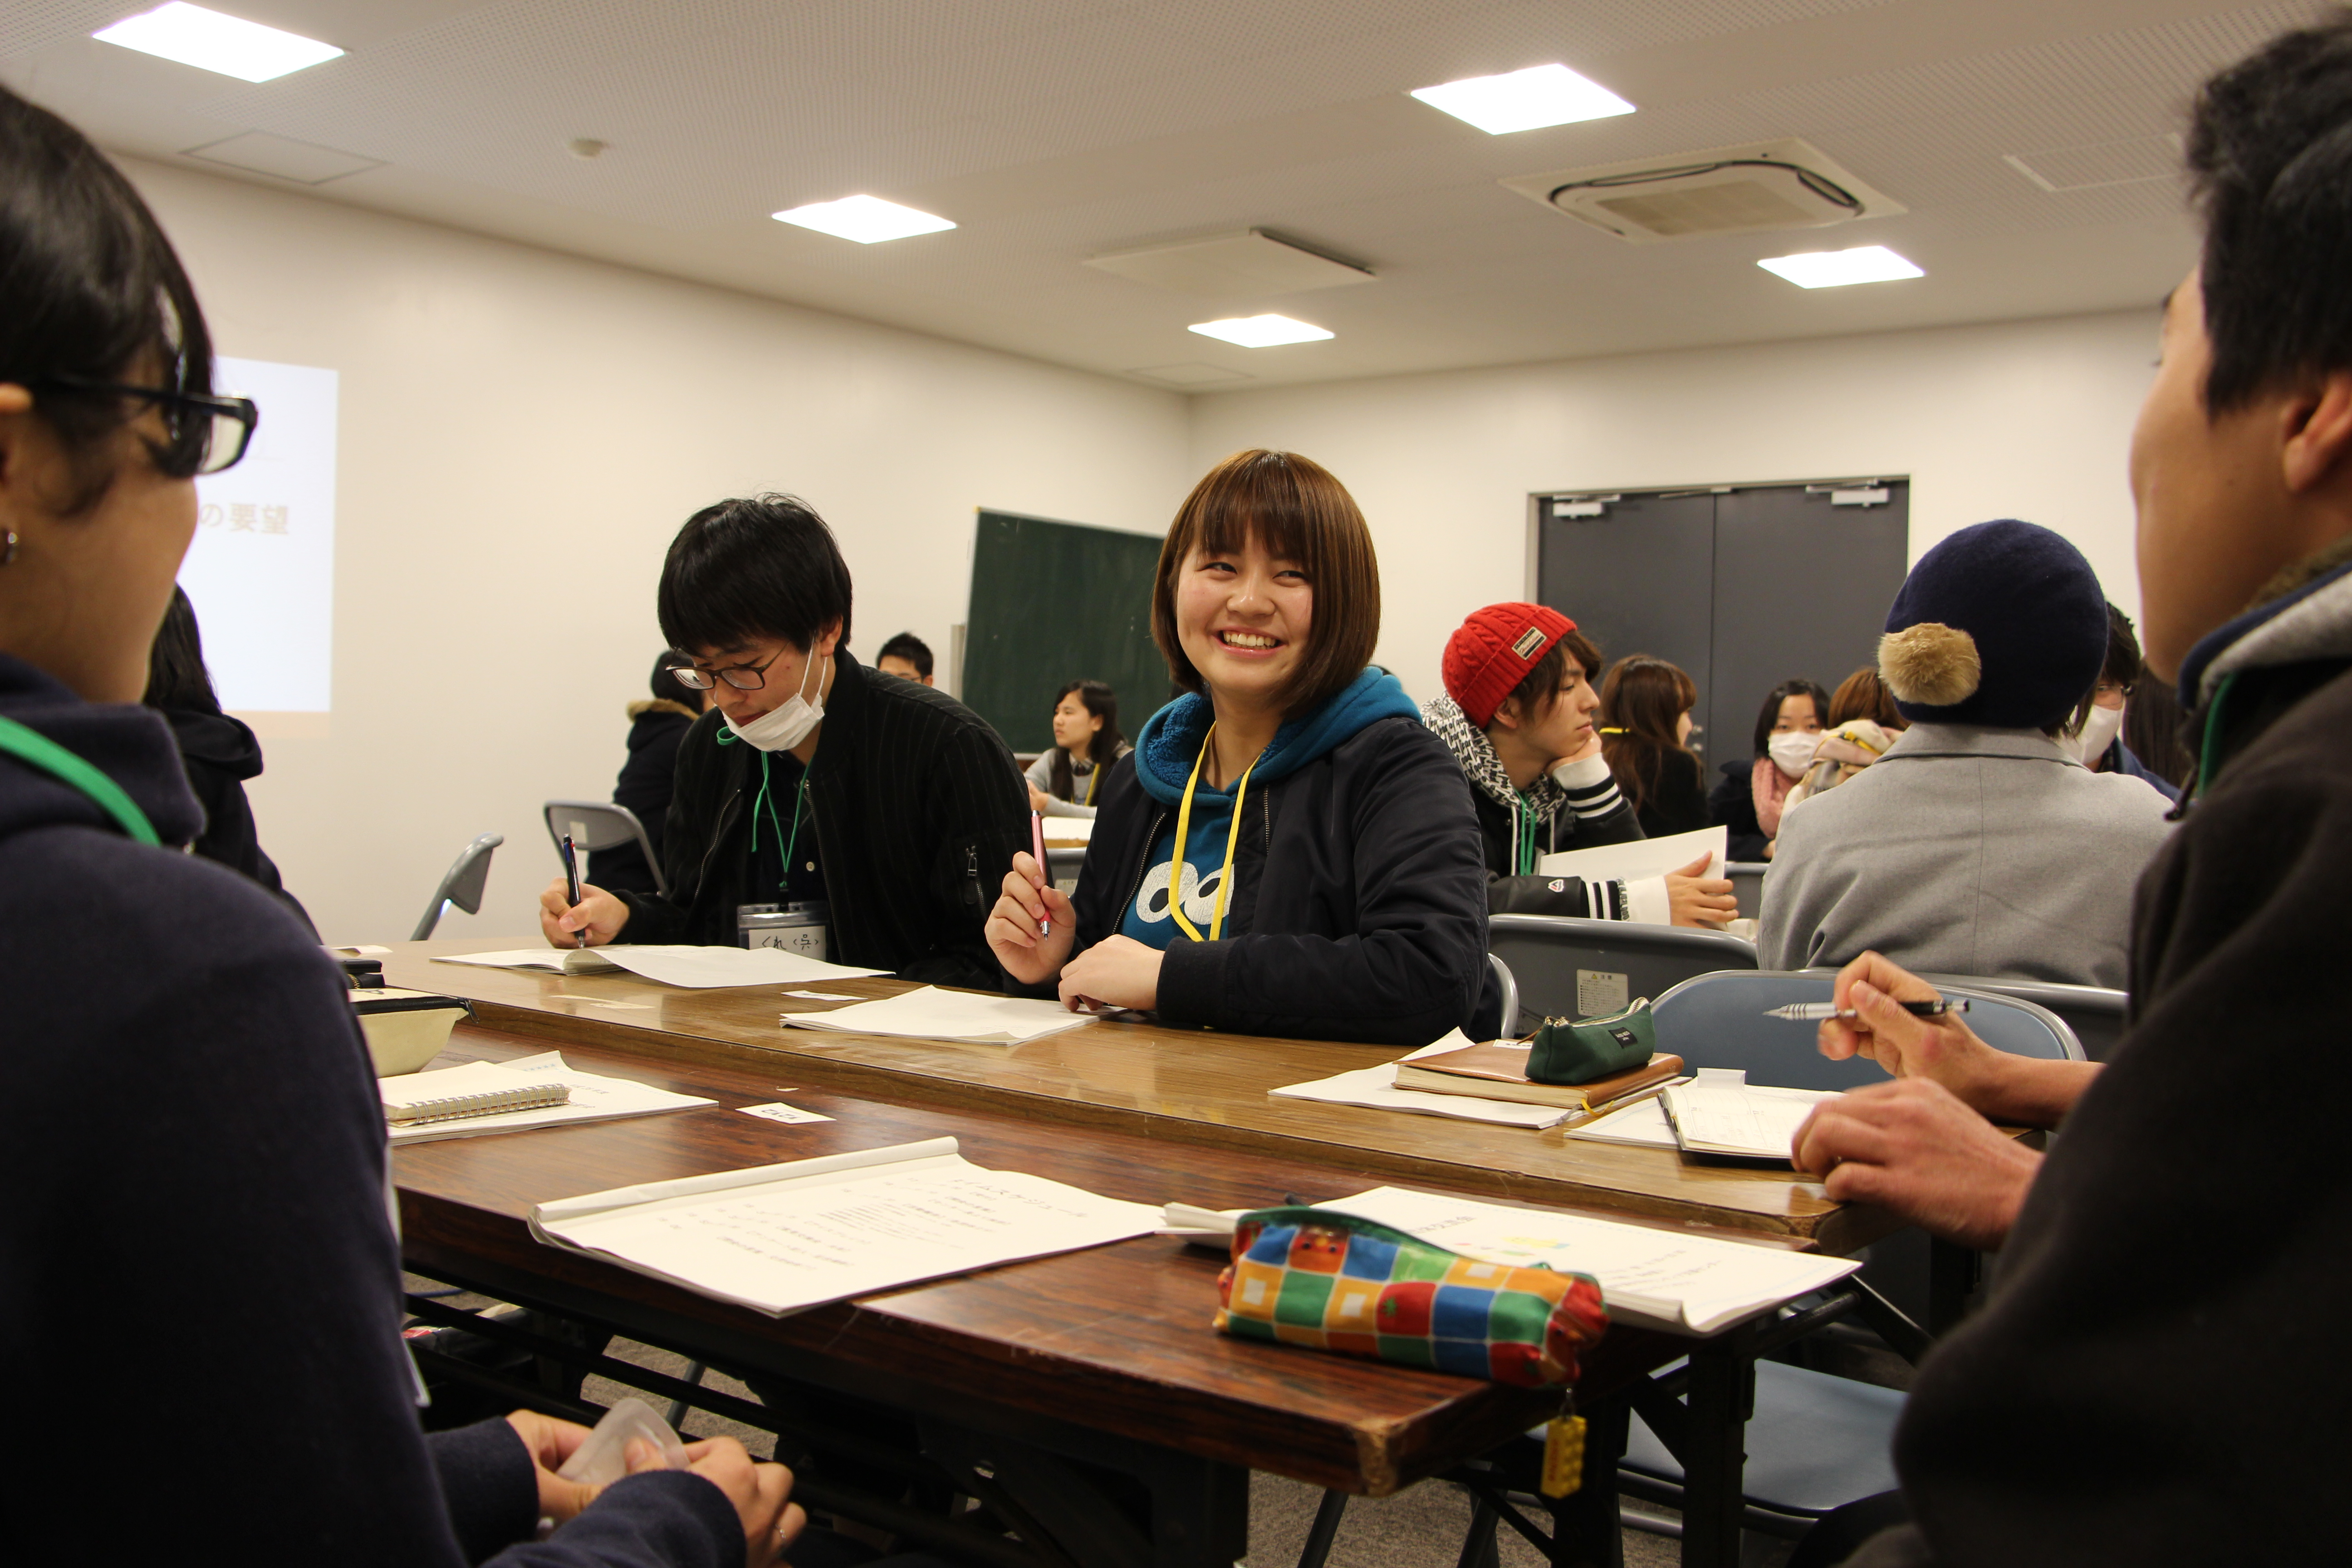 http://www.kagoshima-u.ac.jp/volunt/main/%E4%BA%A4%E6%B5%81%E4%BC%9A%E3%81%AE%E5%86%99%E7%9C%9F%E9%A2%A8%E6%99%AF%EF%BC%92.JPG